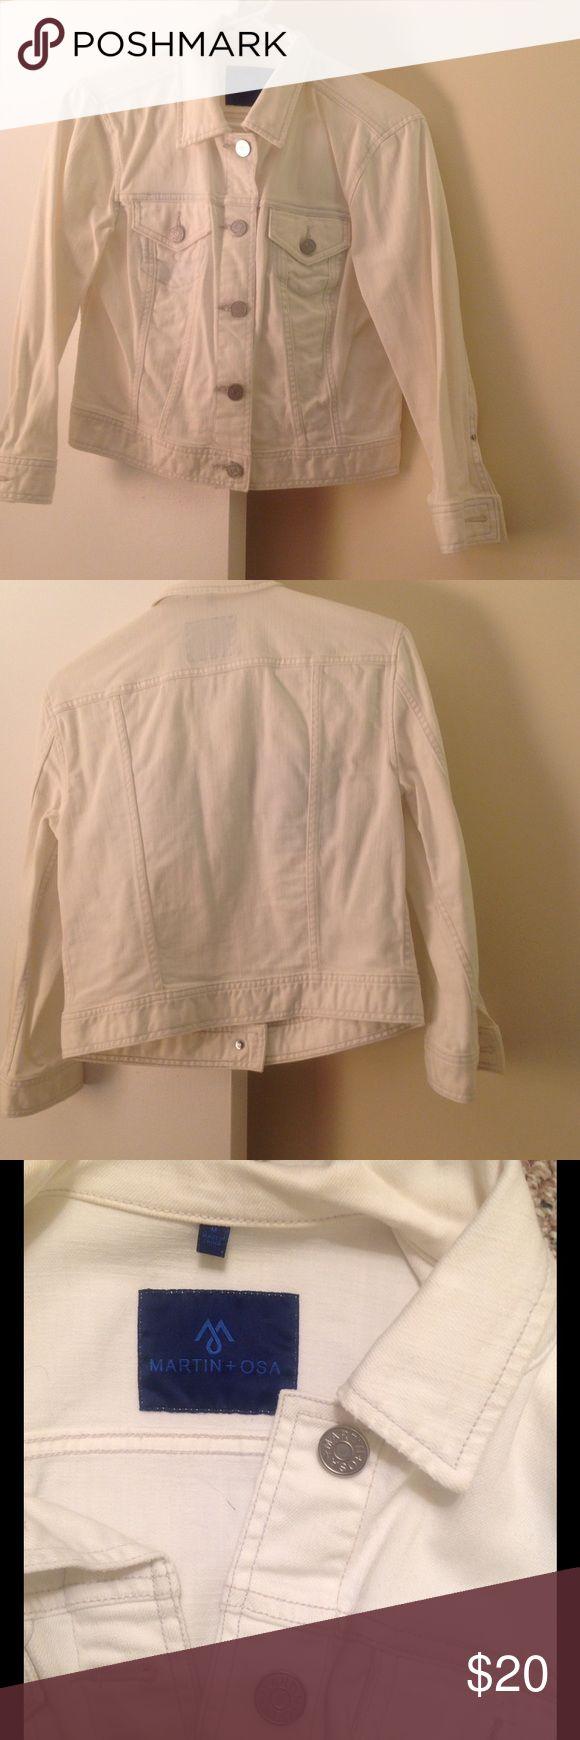 White Jean Jacket - worn twice White Jean Jacket for a chilly summer night! Martin + Osa Jackets & Coats Jean Jackets